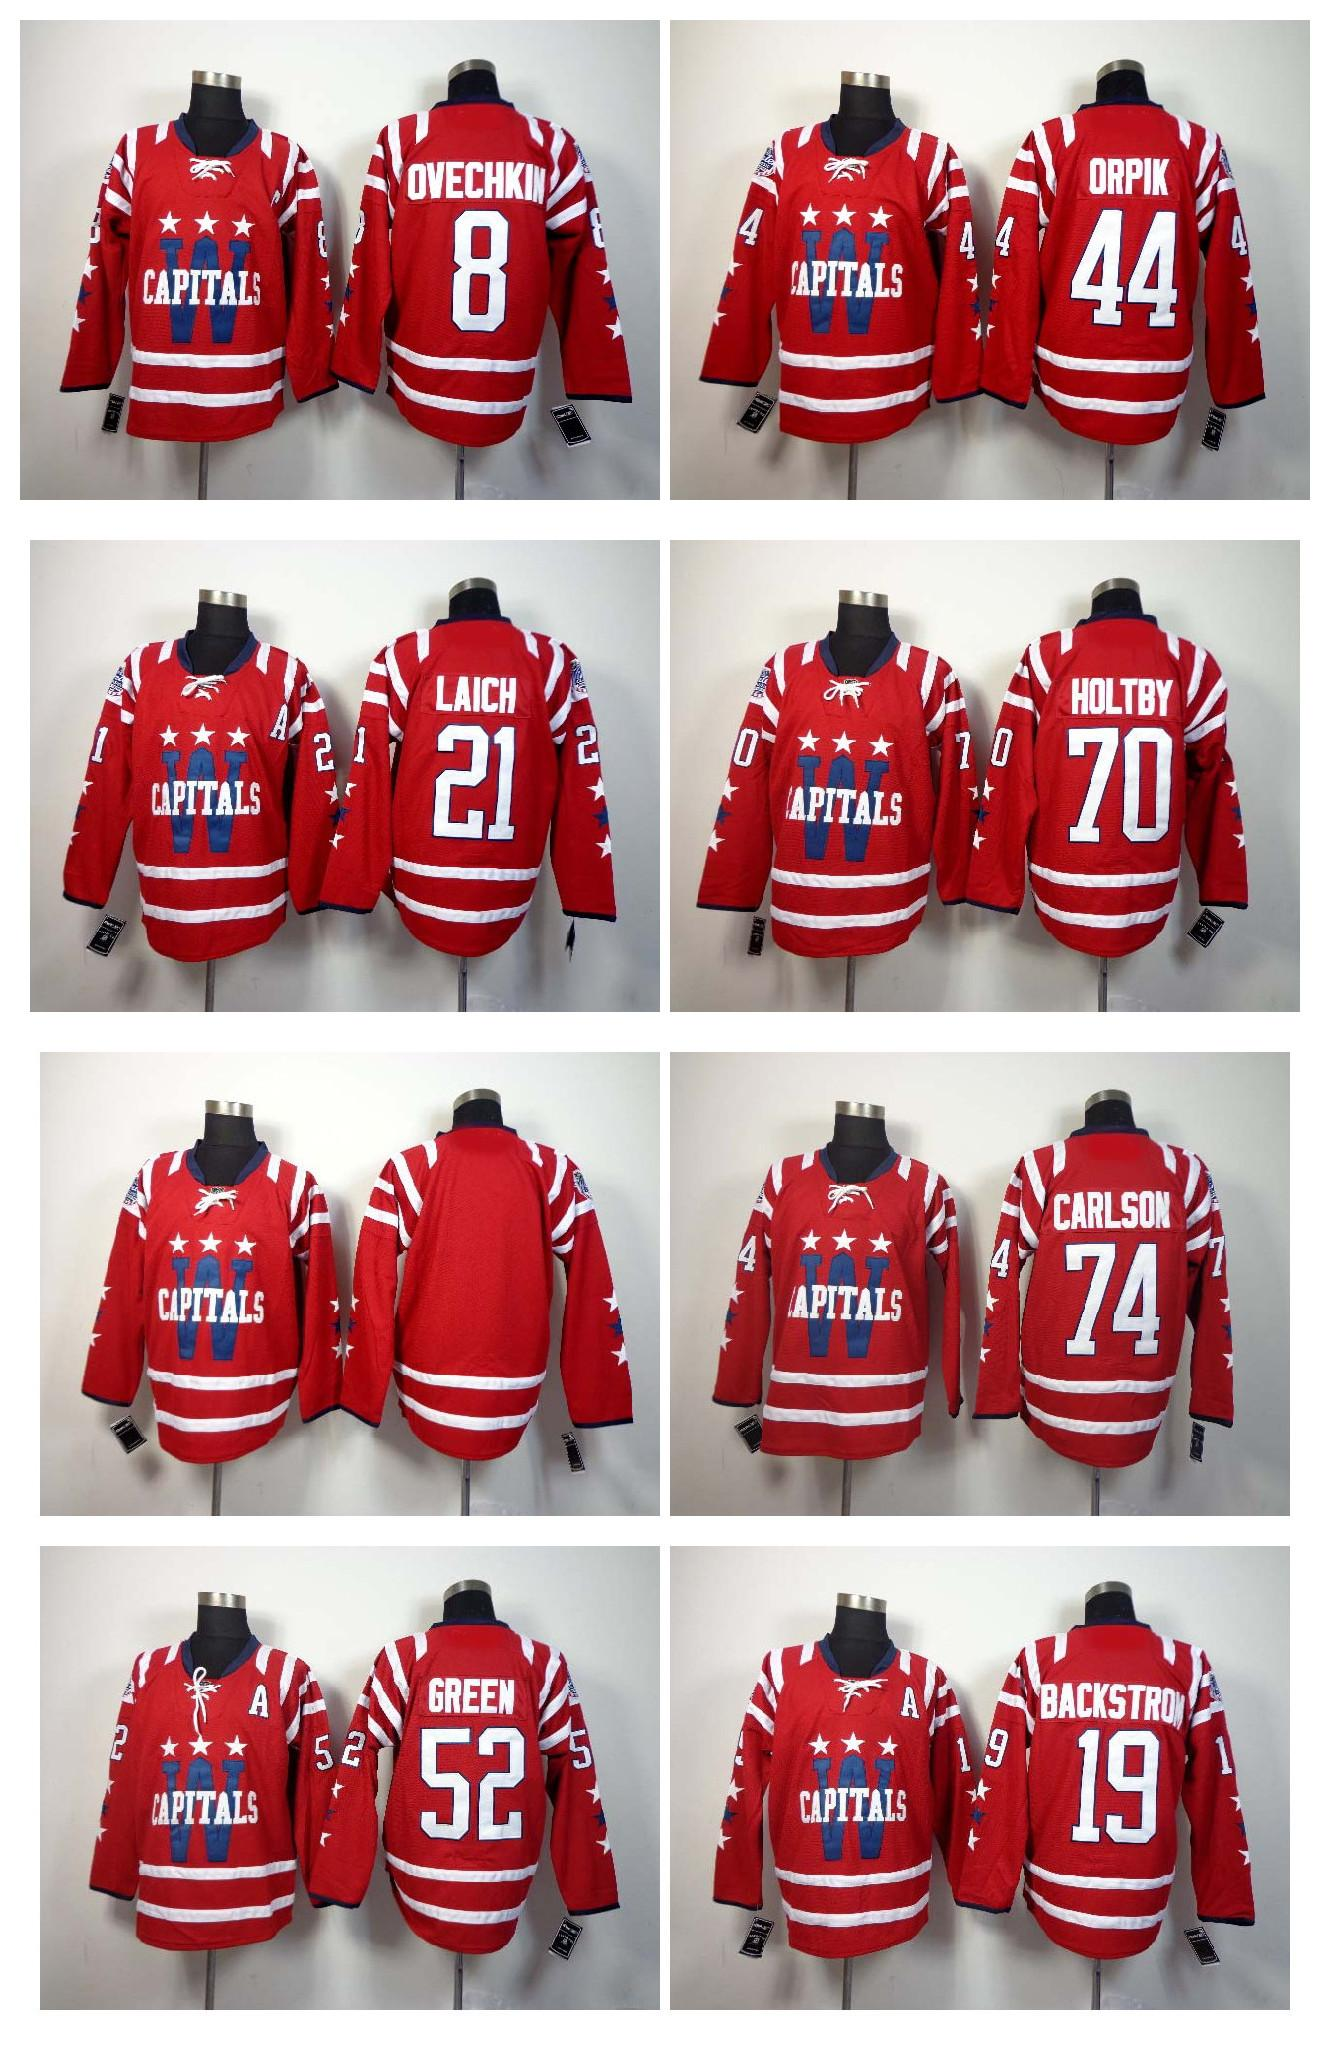 2df1f8bcd5b ... White Winter Classic Washington Capitals Ice Hockey Jerseys 8 Alex  Ovechkin 19 Nicklas Backstrom 44 Brooks Orpik ...